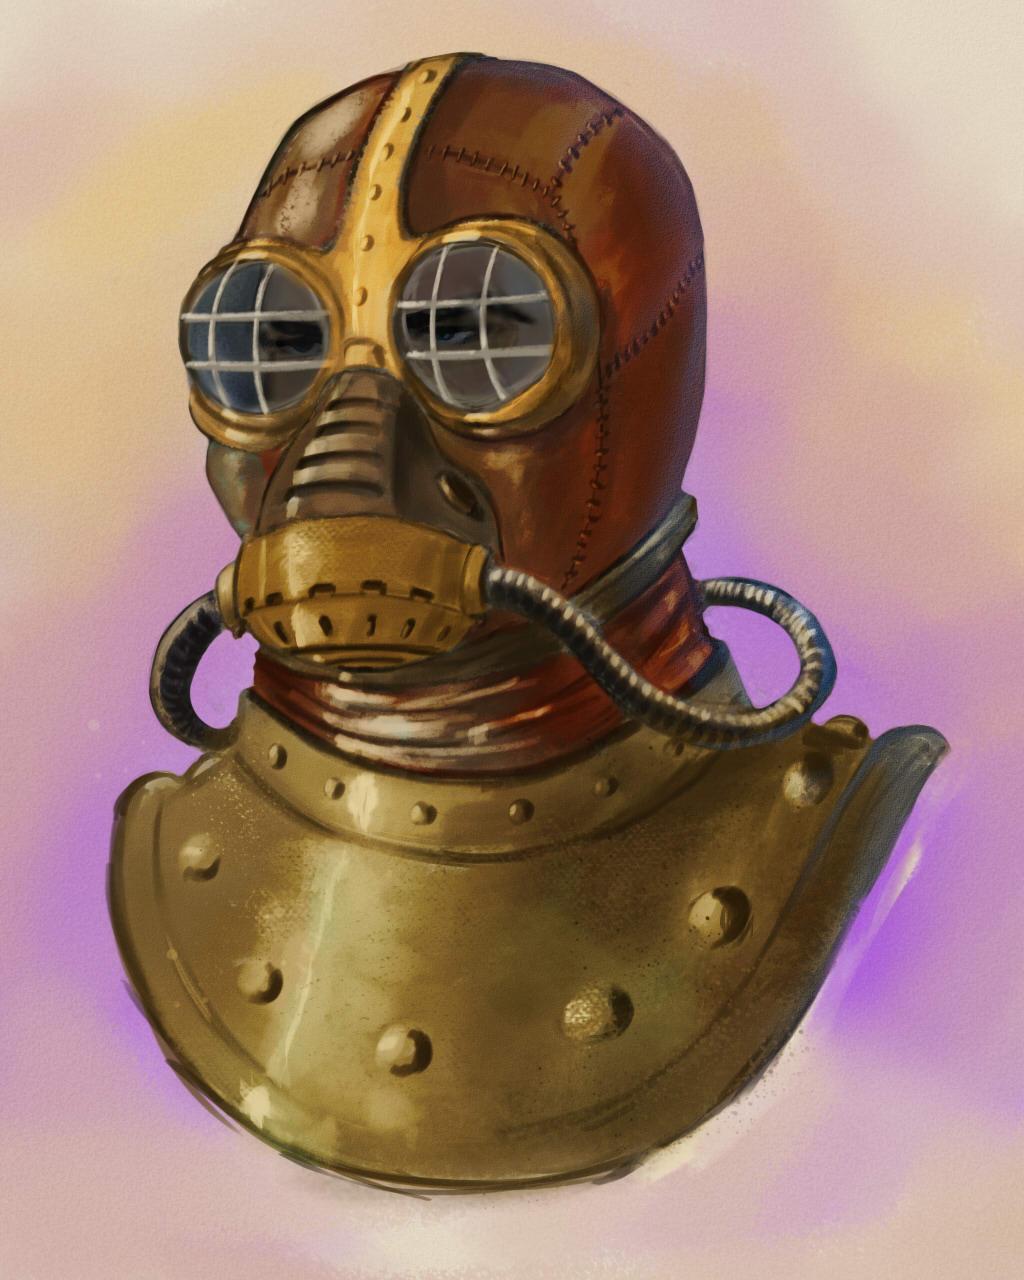 Designall20 July 2012: Joma Santiago: Steampunk Character Designs